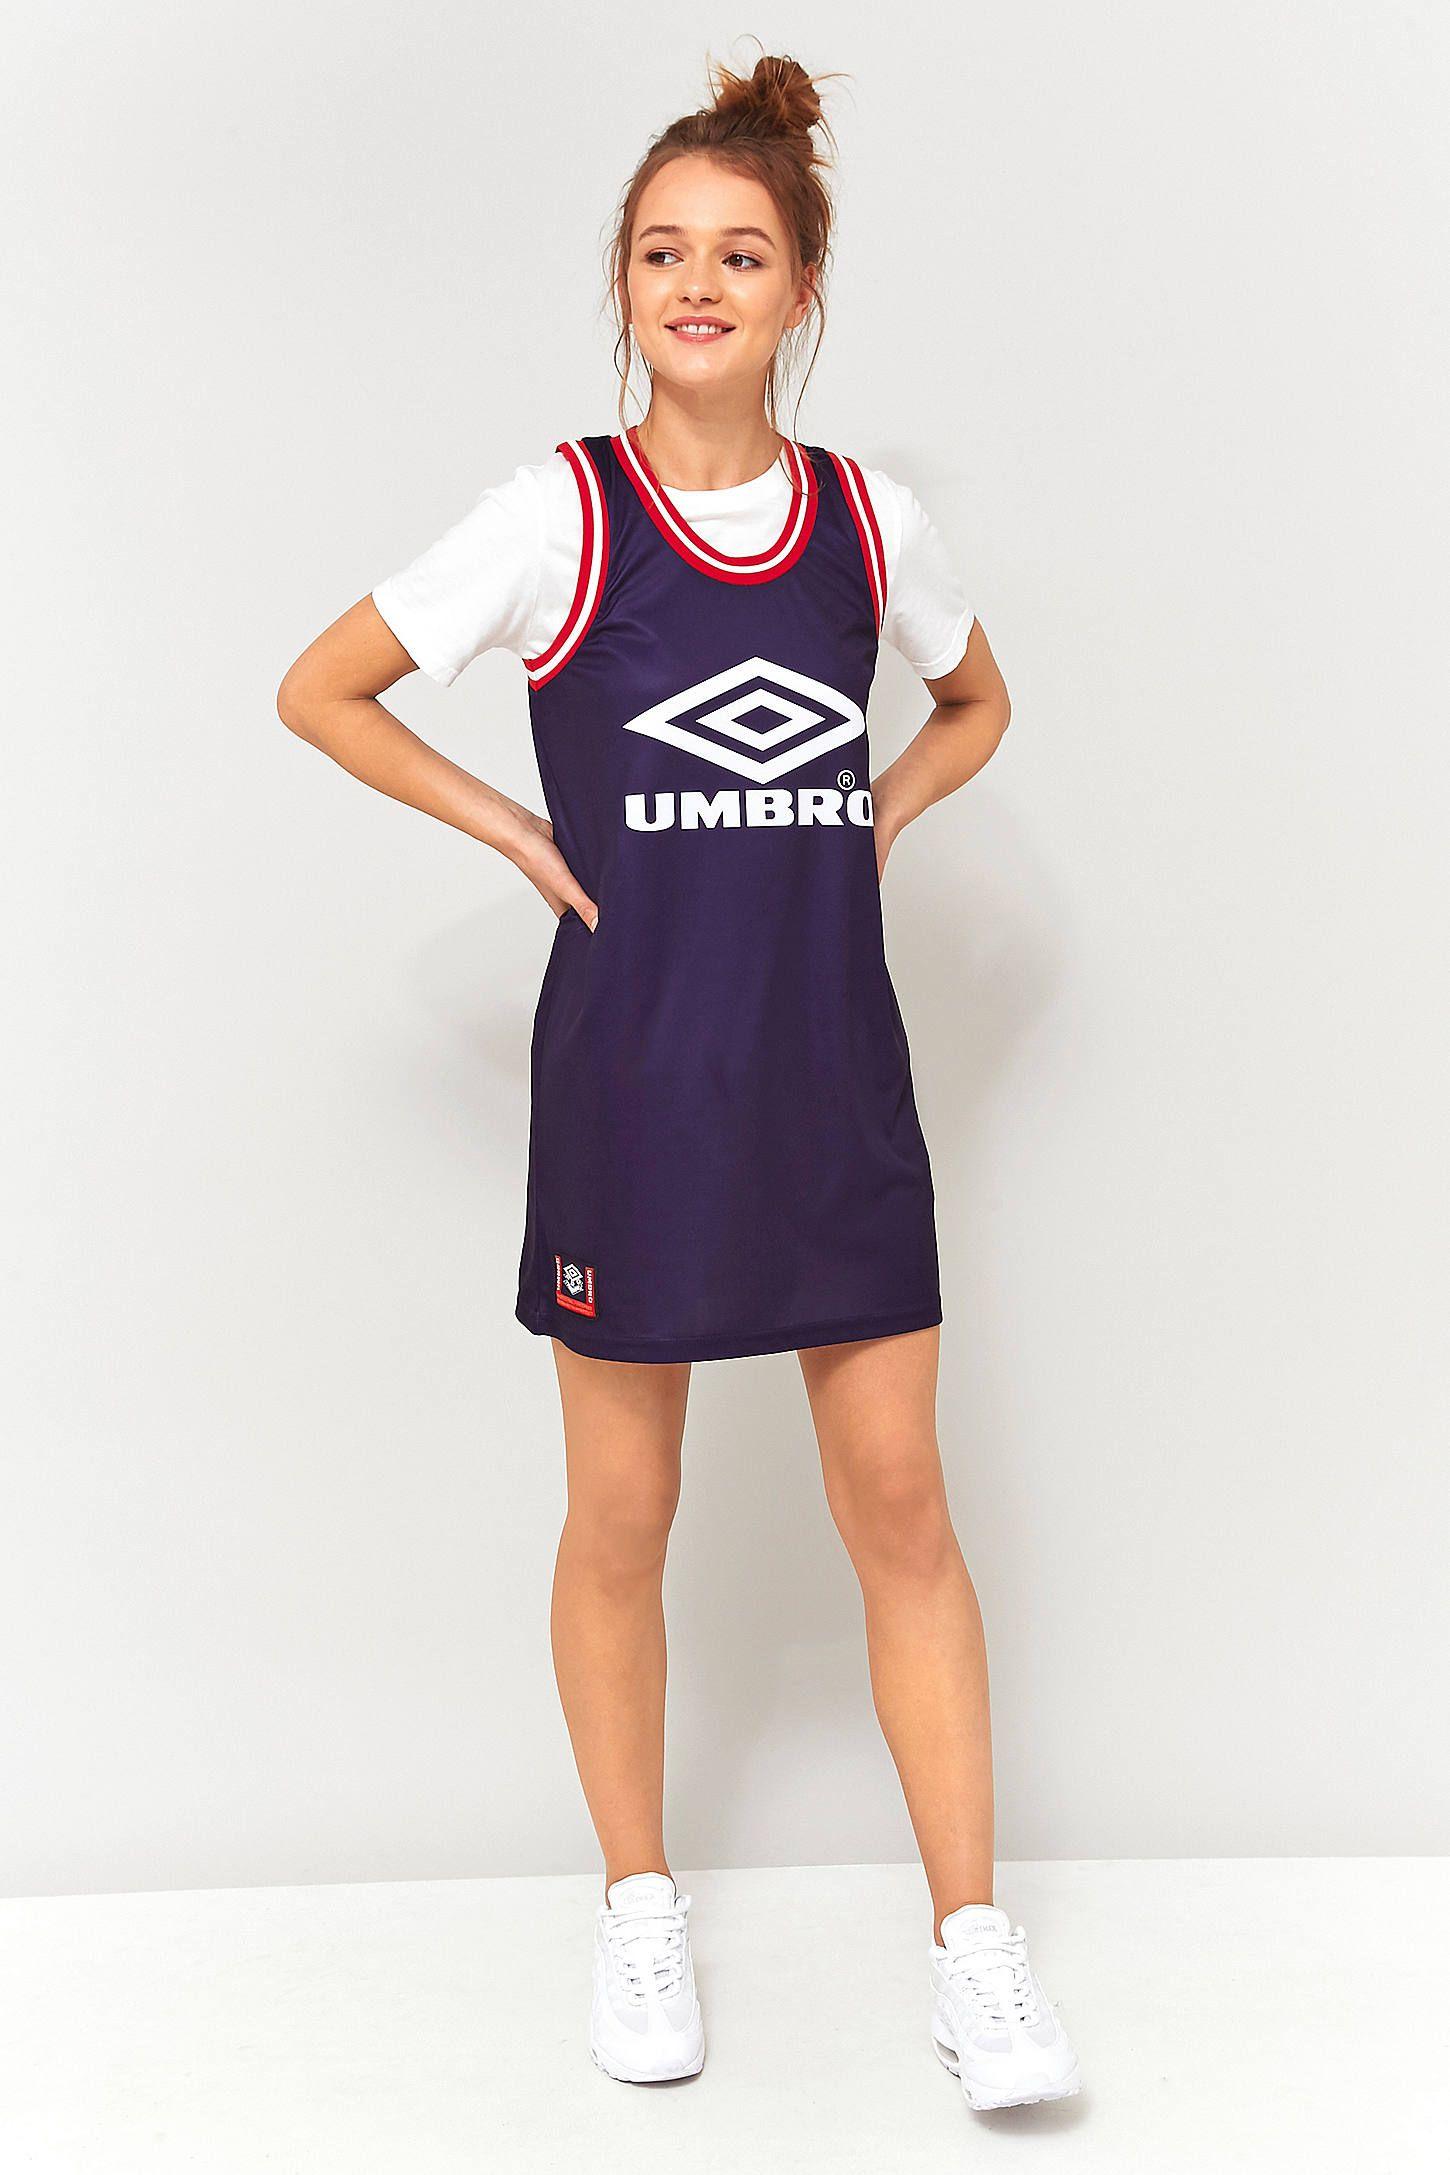 c86ff0a05b Umbro Logo Jersey Tank Dress | umbro | Tank dress, Jumpsuit dress ...